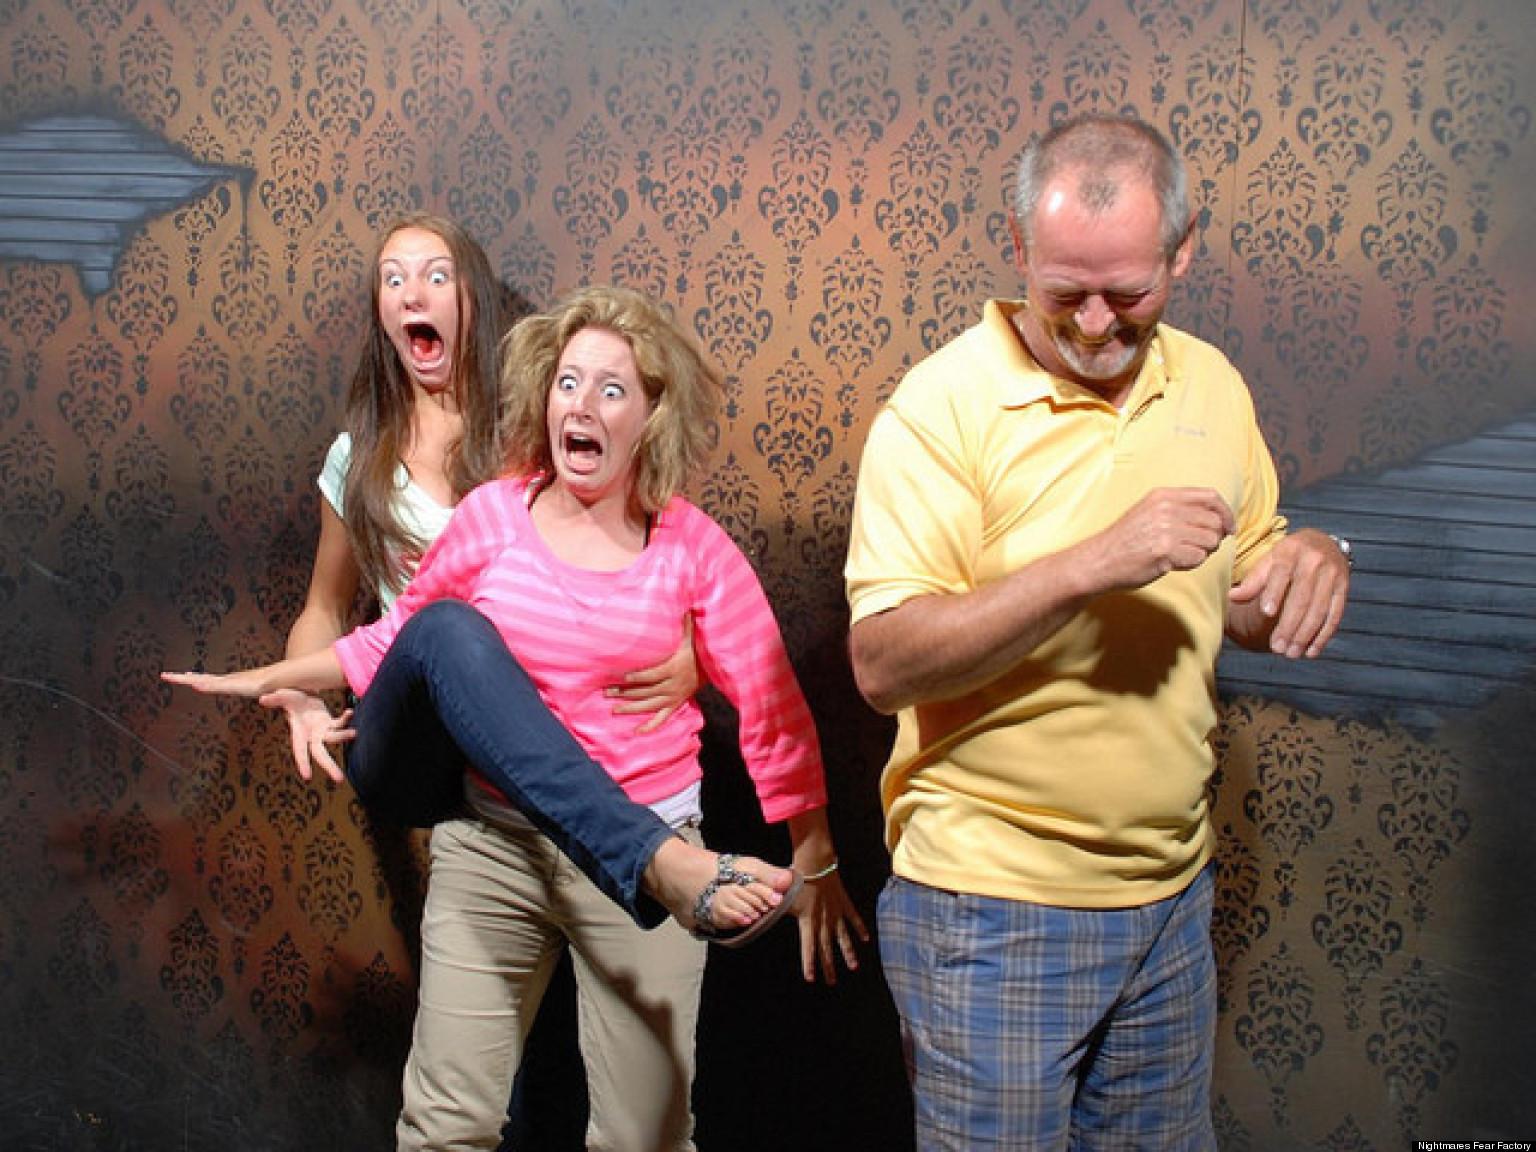 NIGHTMARES-FEAR-FACTORY-PHOTOS-facebook.jpg